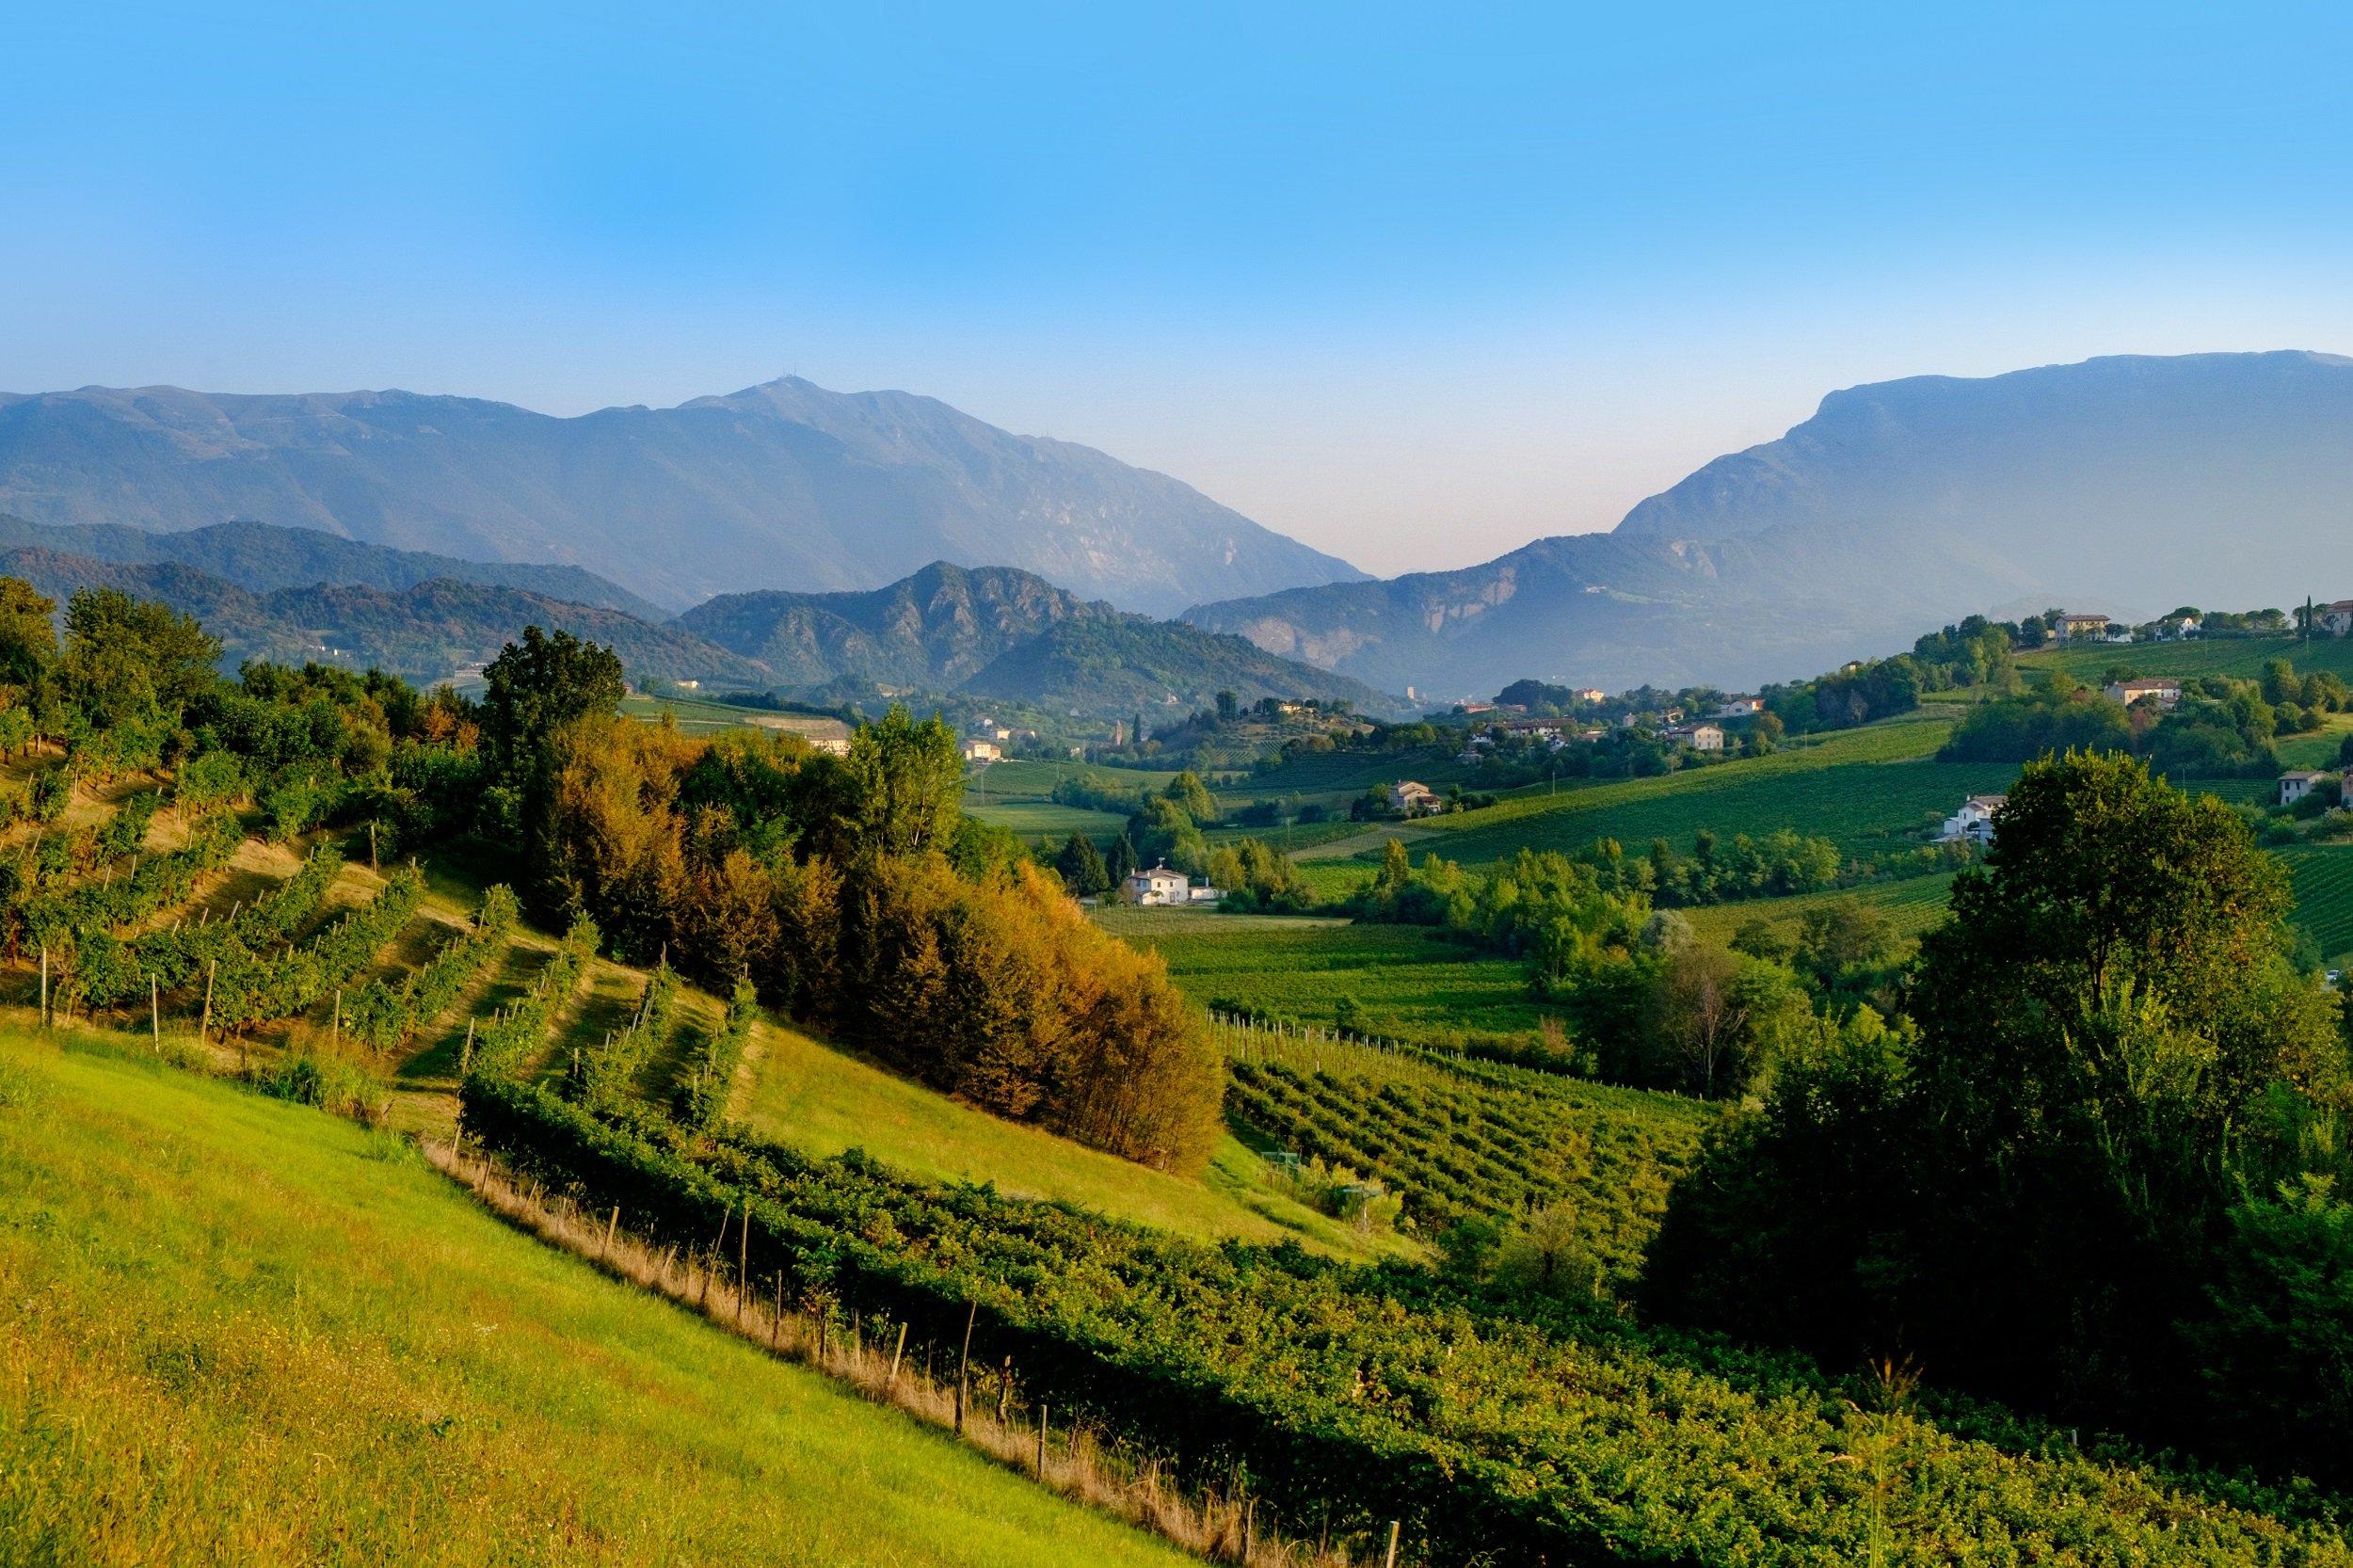 Venice, Verona, Lake Garda & Countryside 5 Day Tour Package_2